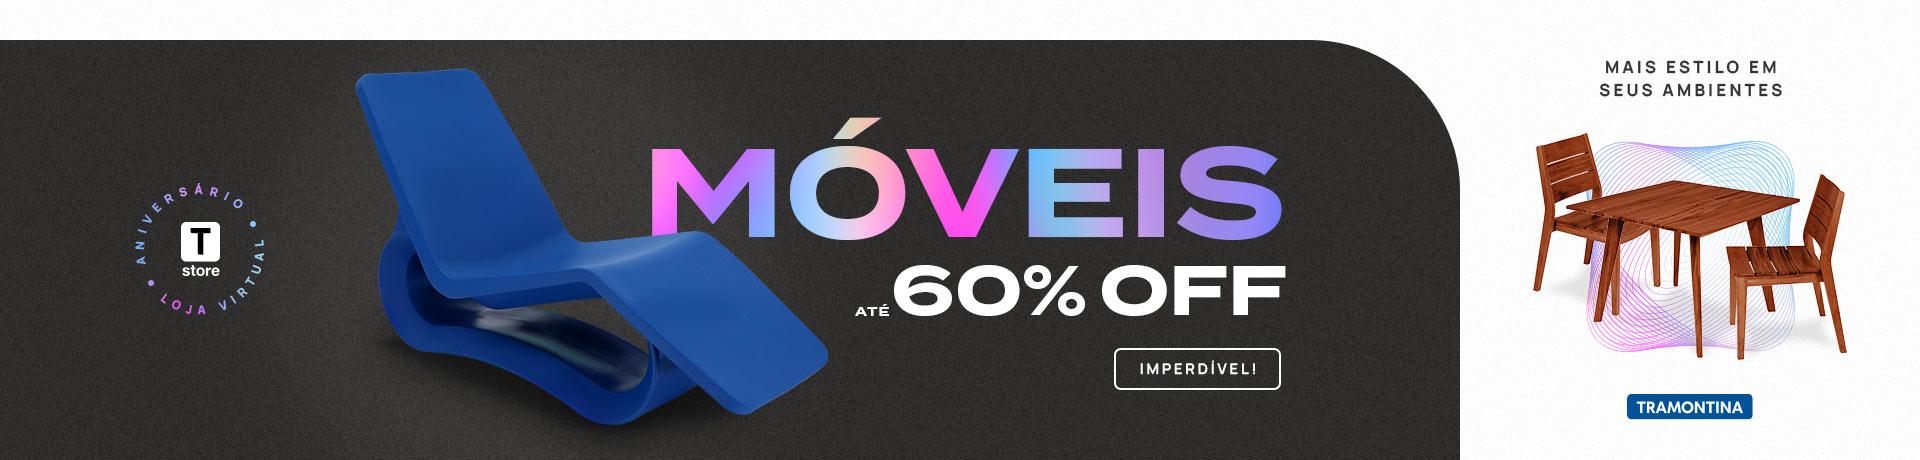 Banner - 7 Moveis